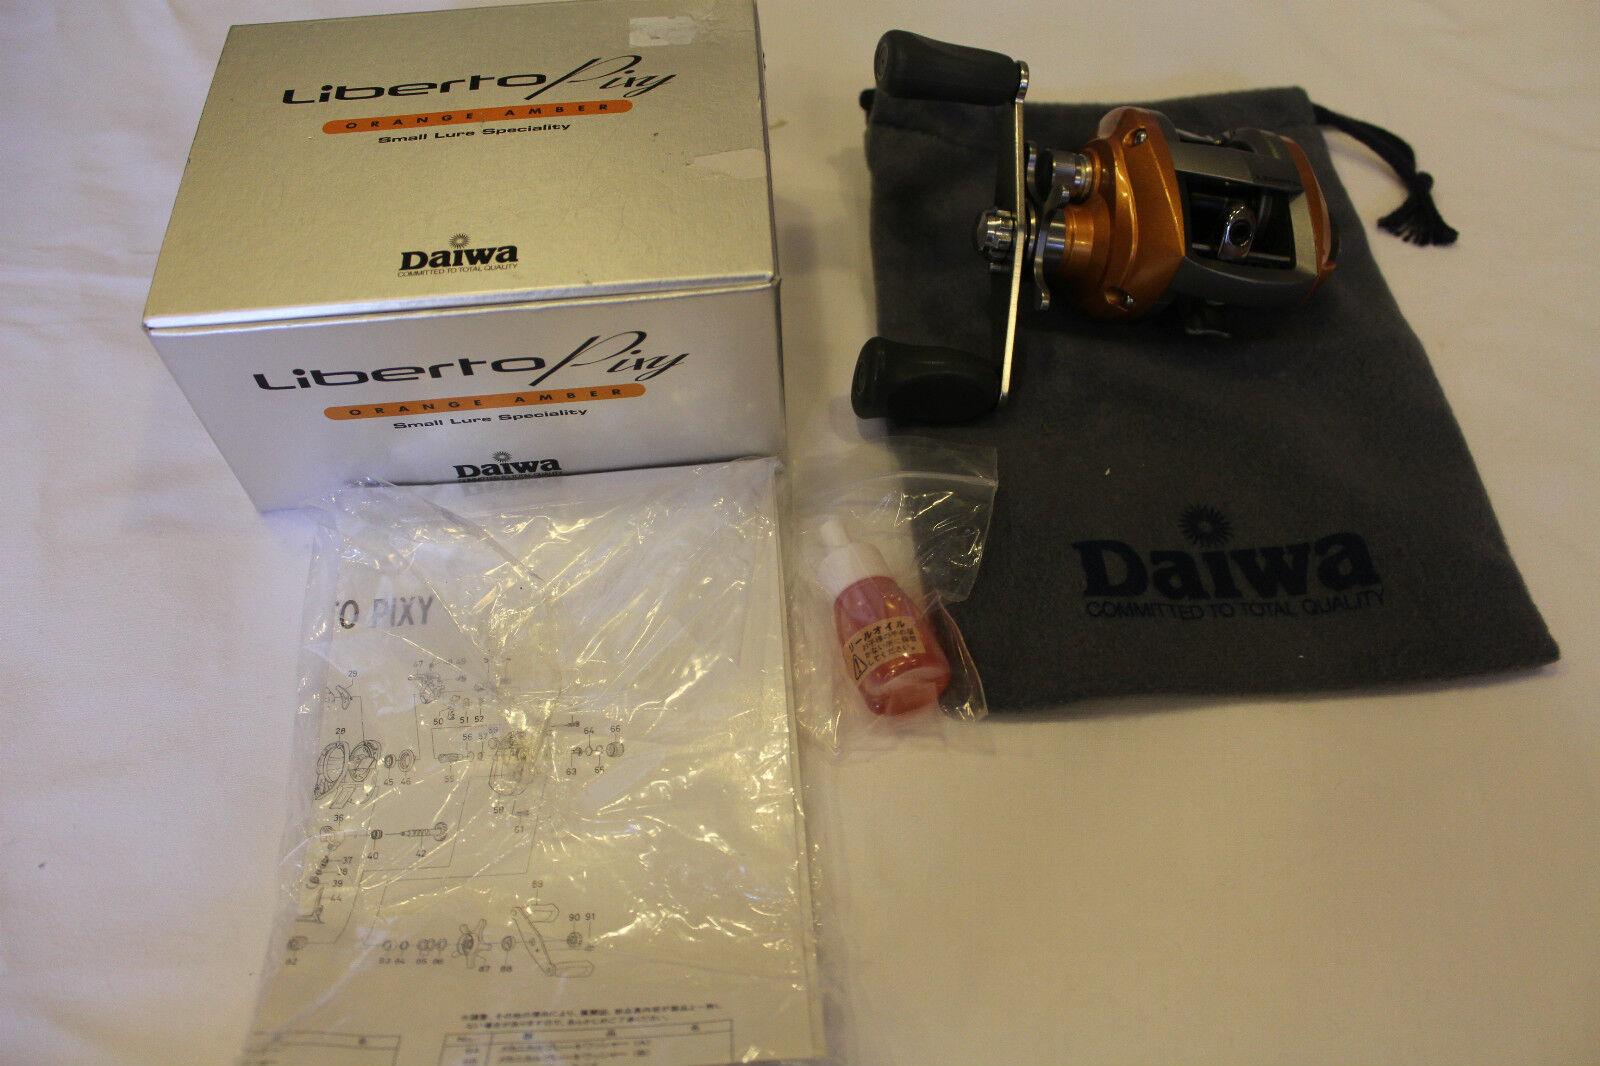 DAIWA   LIBERTO PIXY- orange AMBER -MADE IN JAPAN-Nr 229  best offer